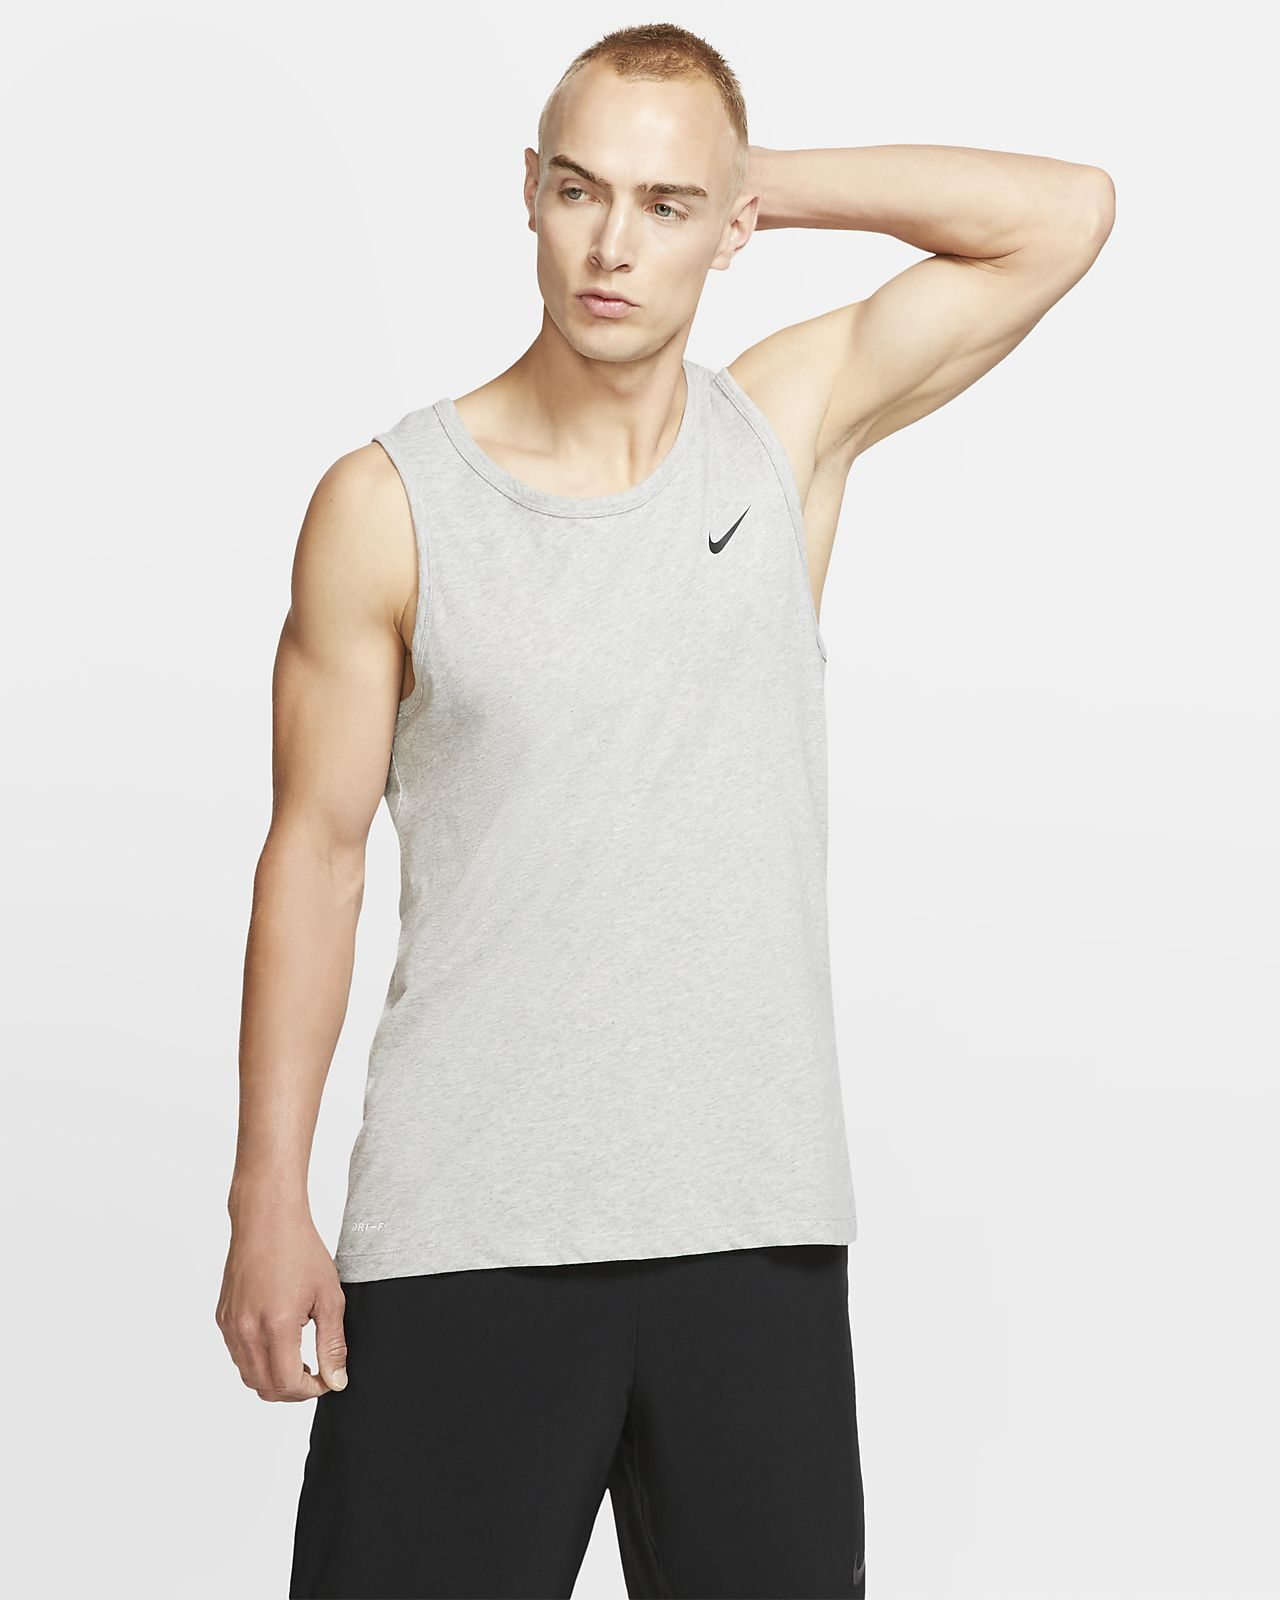 Pánské tréninkové tílko Nike Dri-FIT